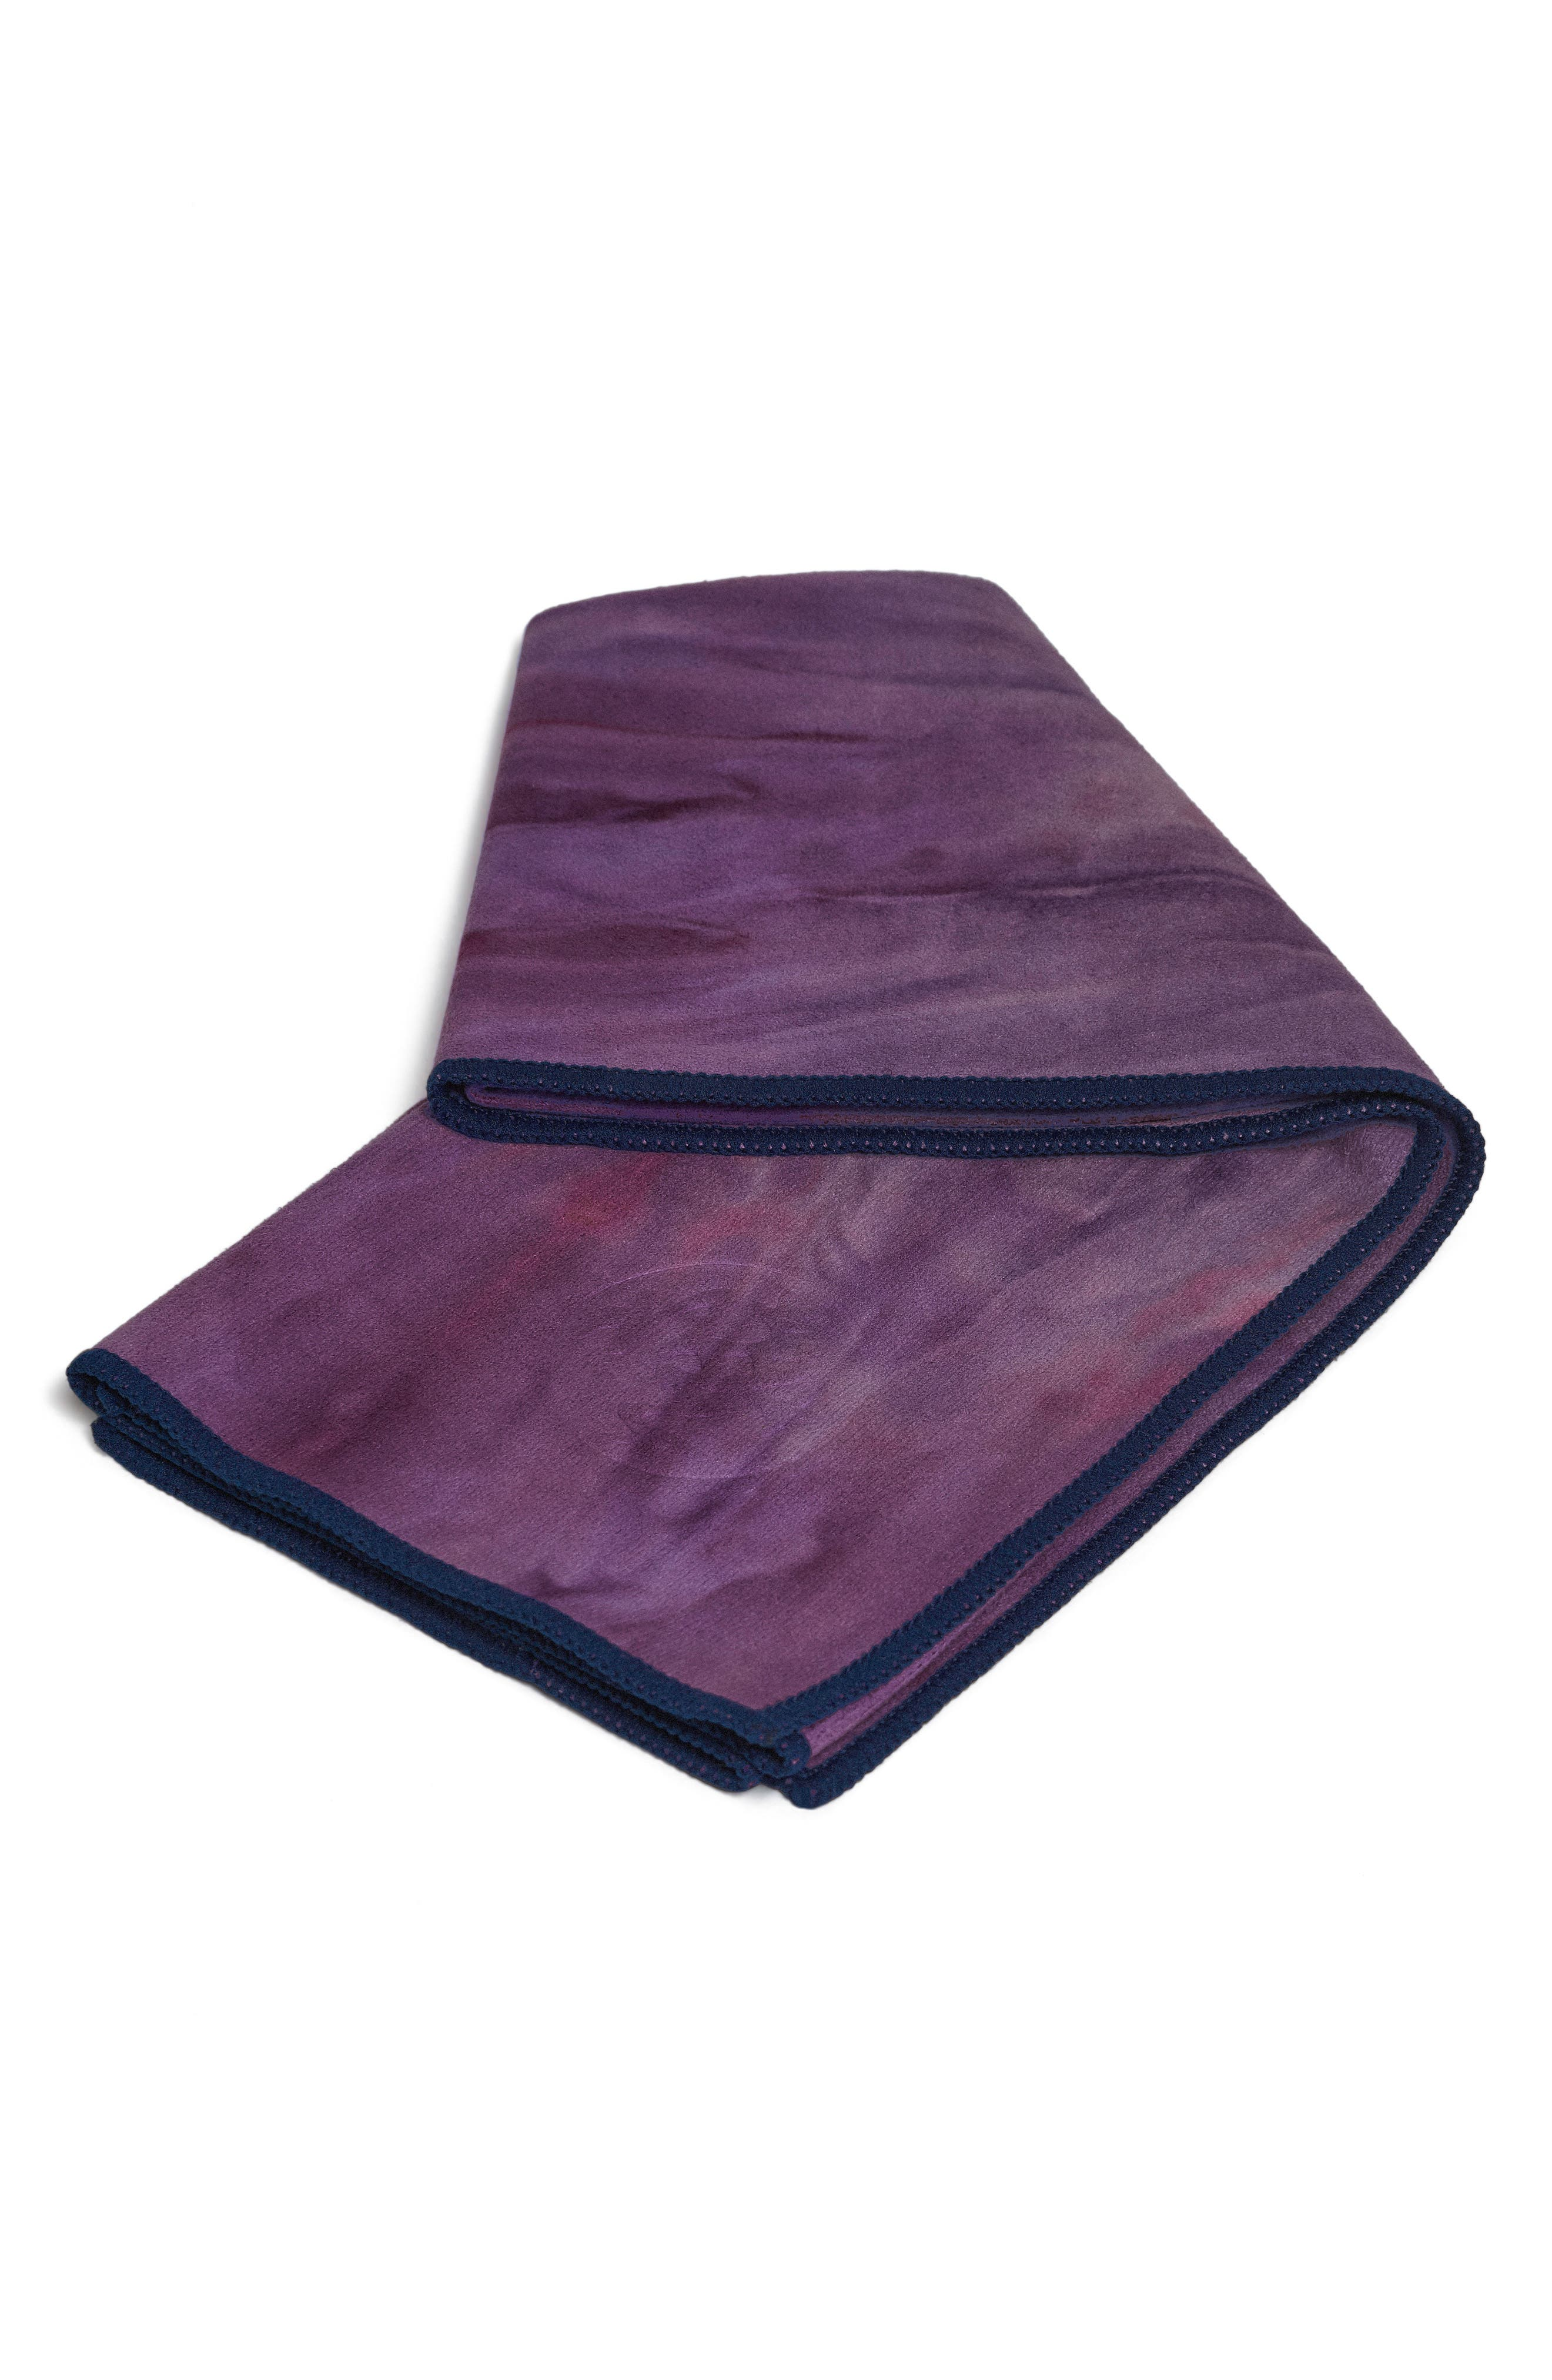 Manduka eQua® Indulge Yoga Hand Towel